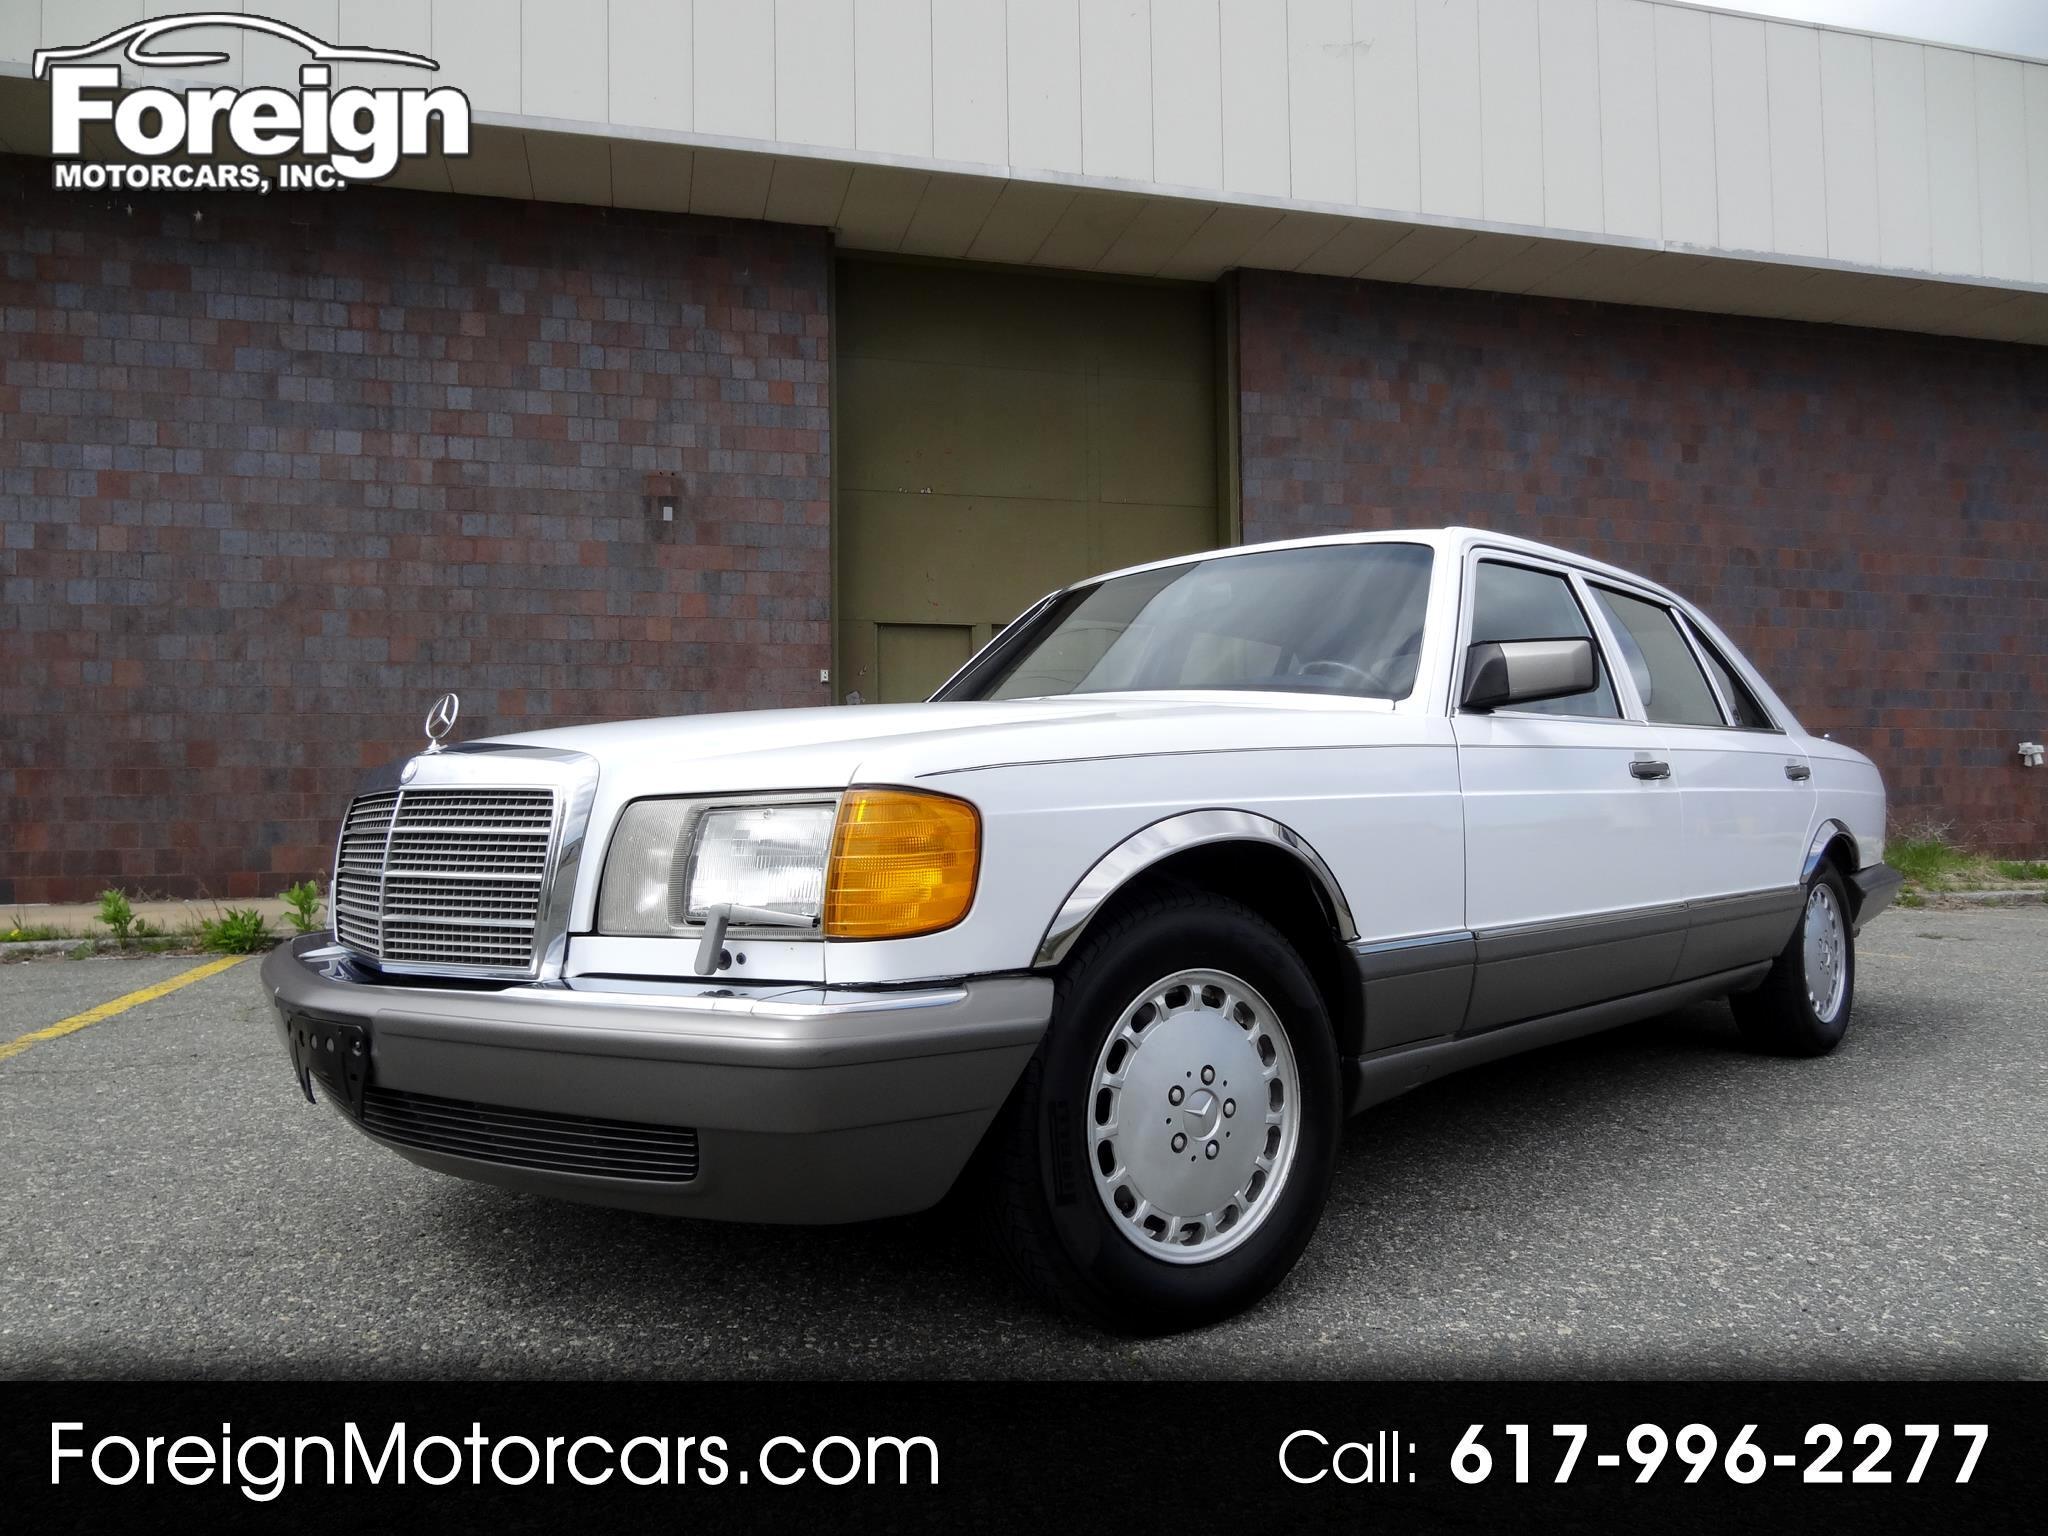 Mercedes-Benz 420 SEL sedan 1988